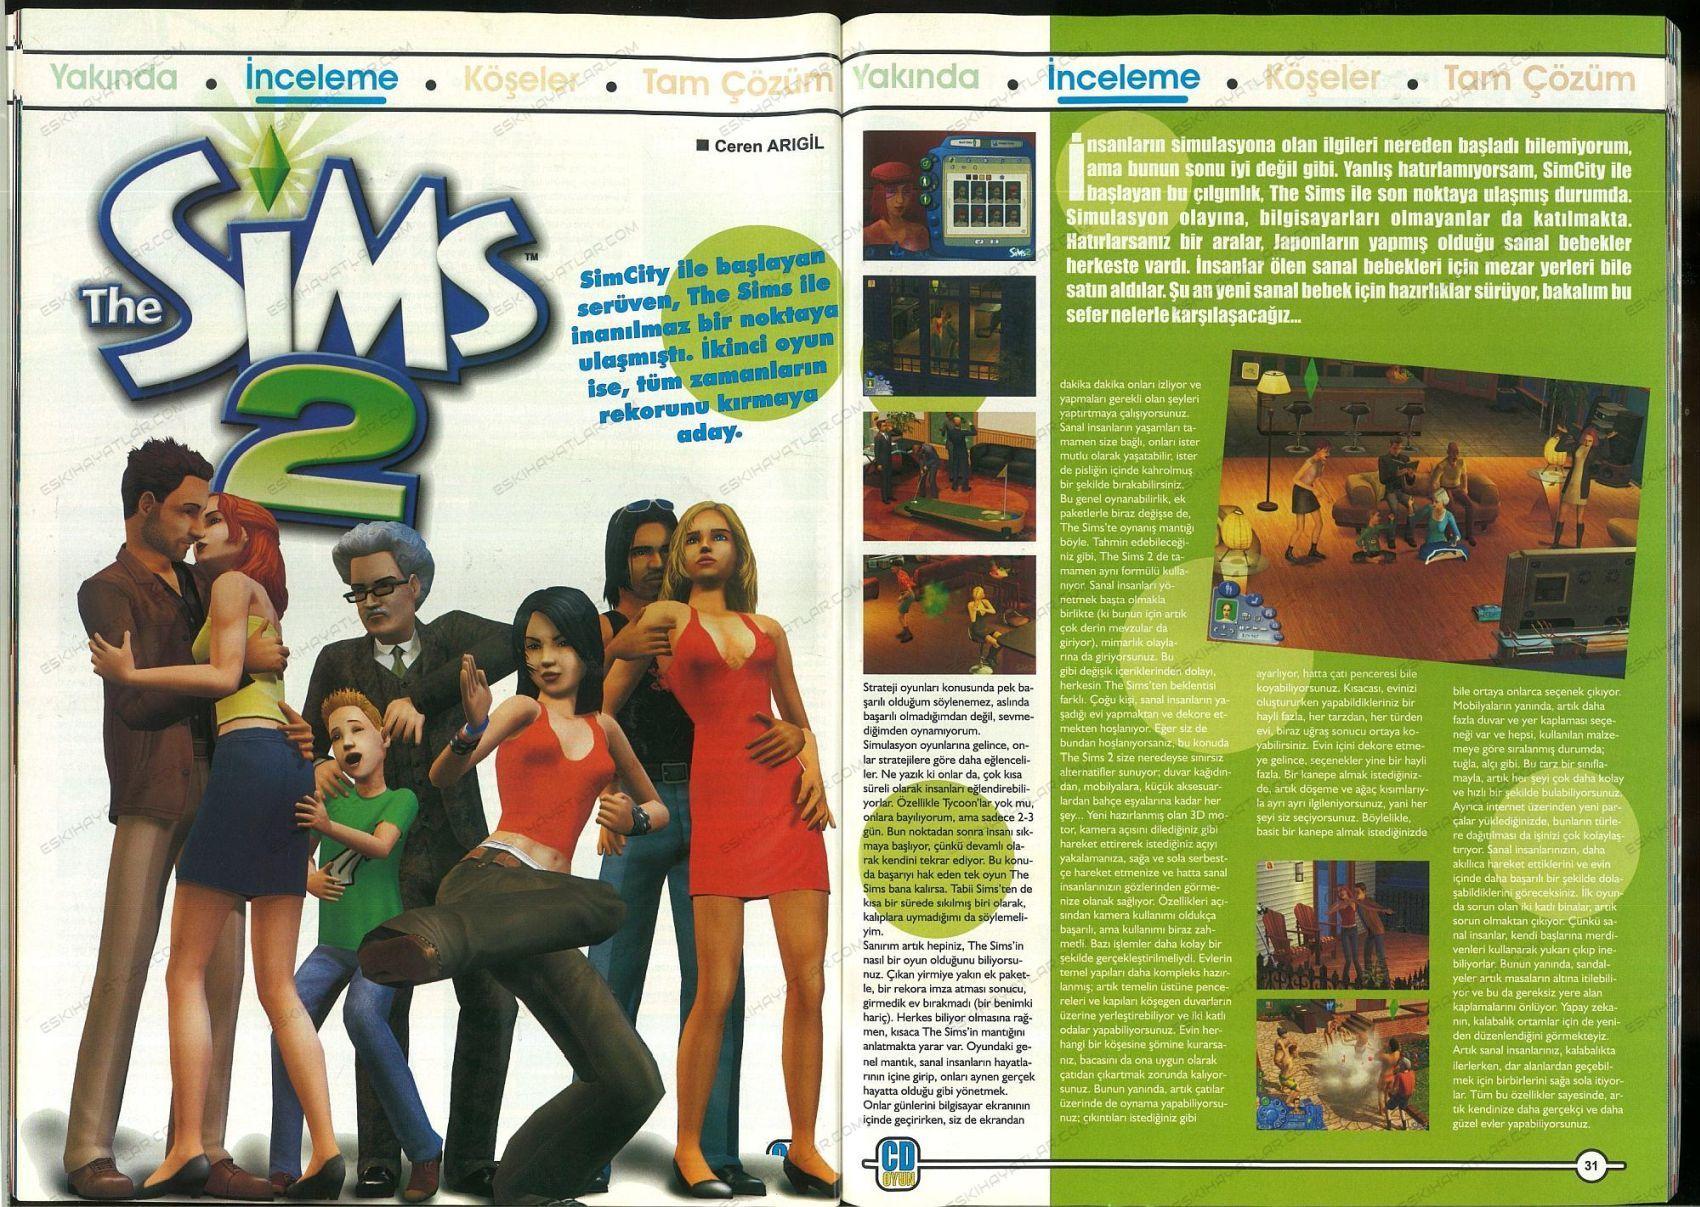 0226-sims2-oyun-inceleme-cd-oyun-dergisi-2002-electronic-arts-the-sims2 (1)